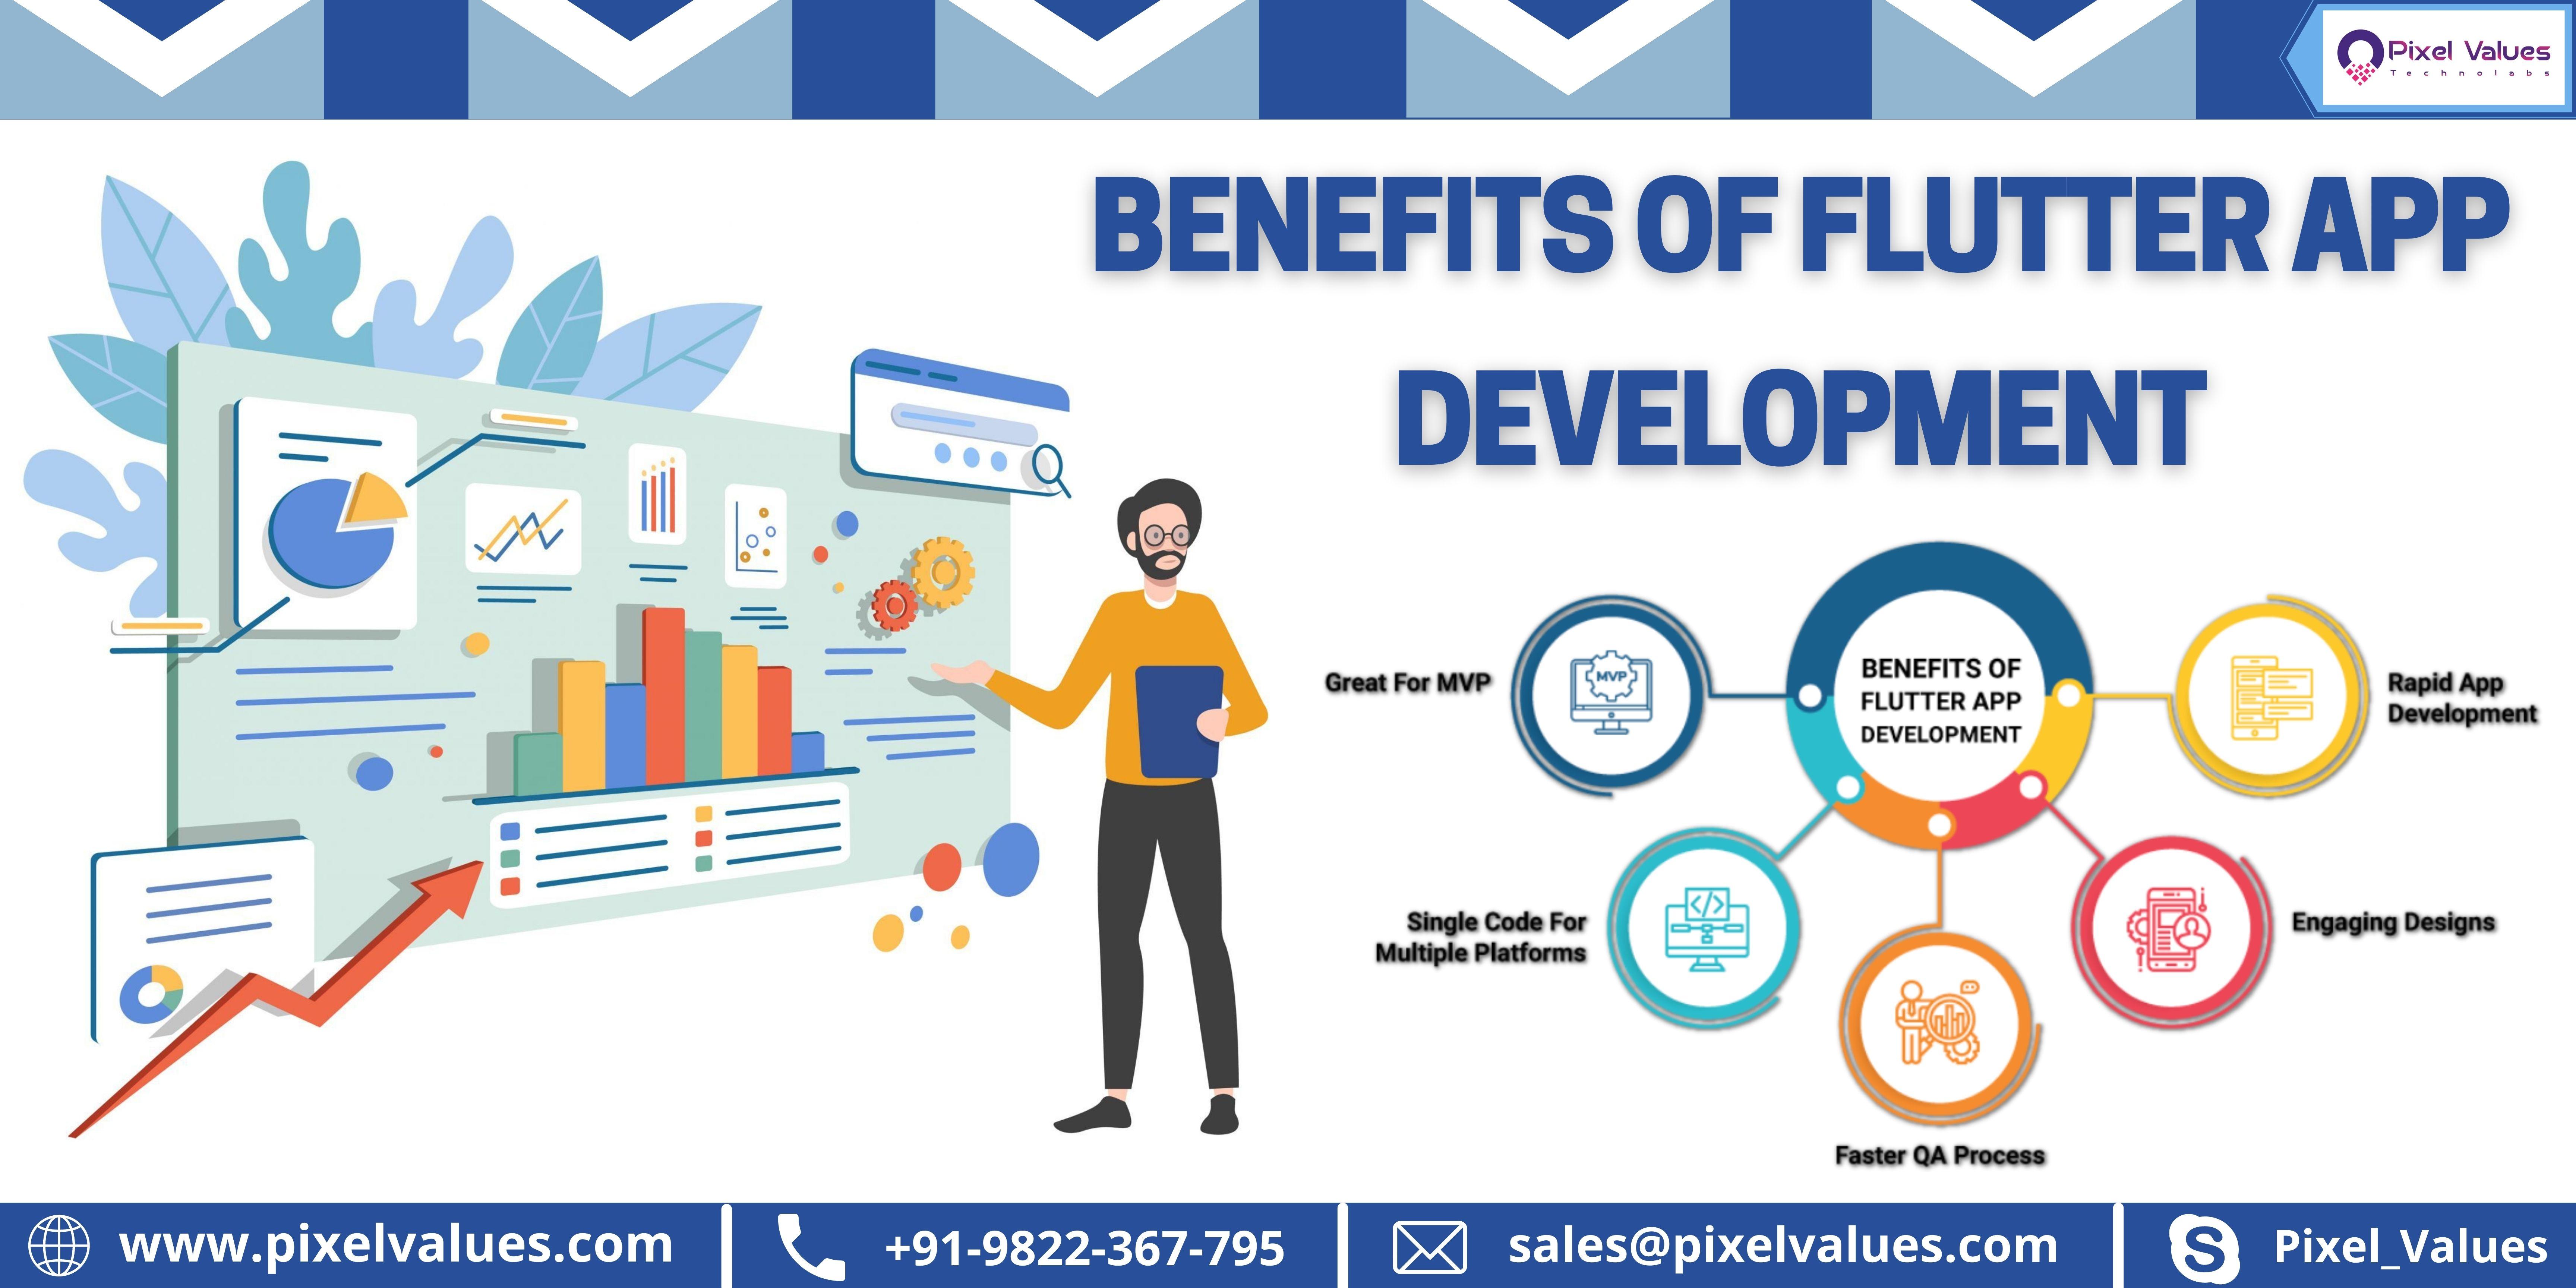 BENEFITS OF FLUTTERAPP DEVELOPMENT                BENEFITS OF  ( F FLUTTER APP | | DEVELOPMENT \ J Doveinpment     Faster QA Process tis} www.pixelvalues.com | +91-9822-367-795 DK] sales@pixelvalues.com